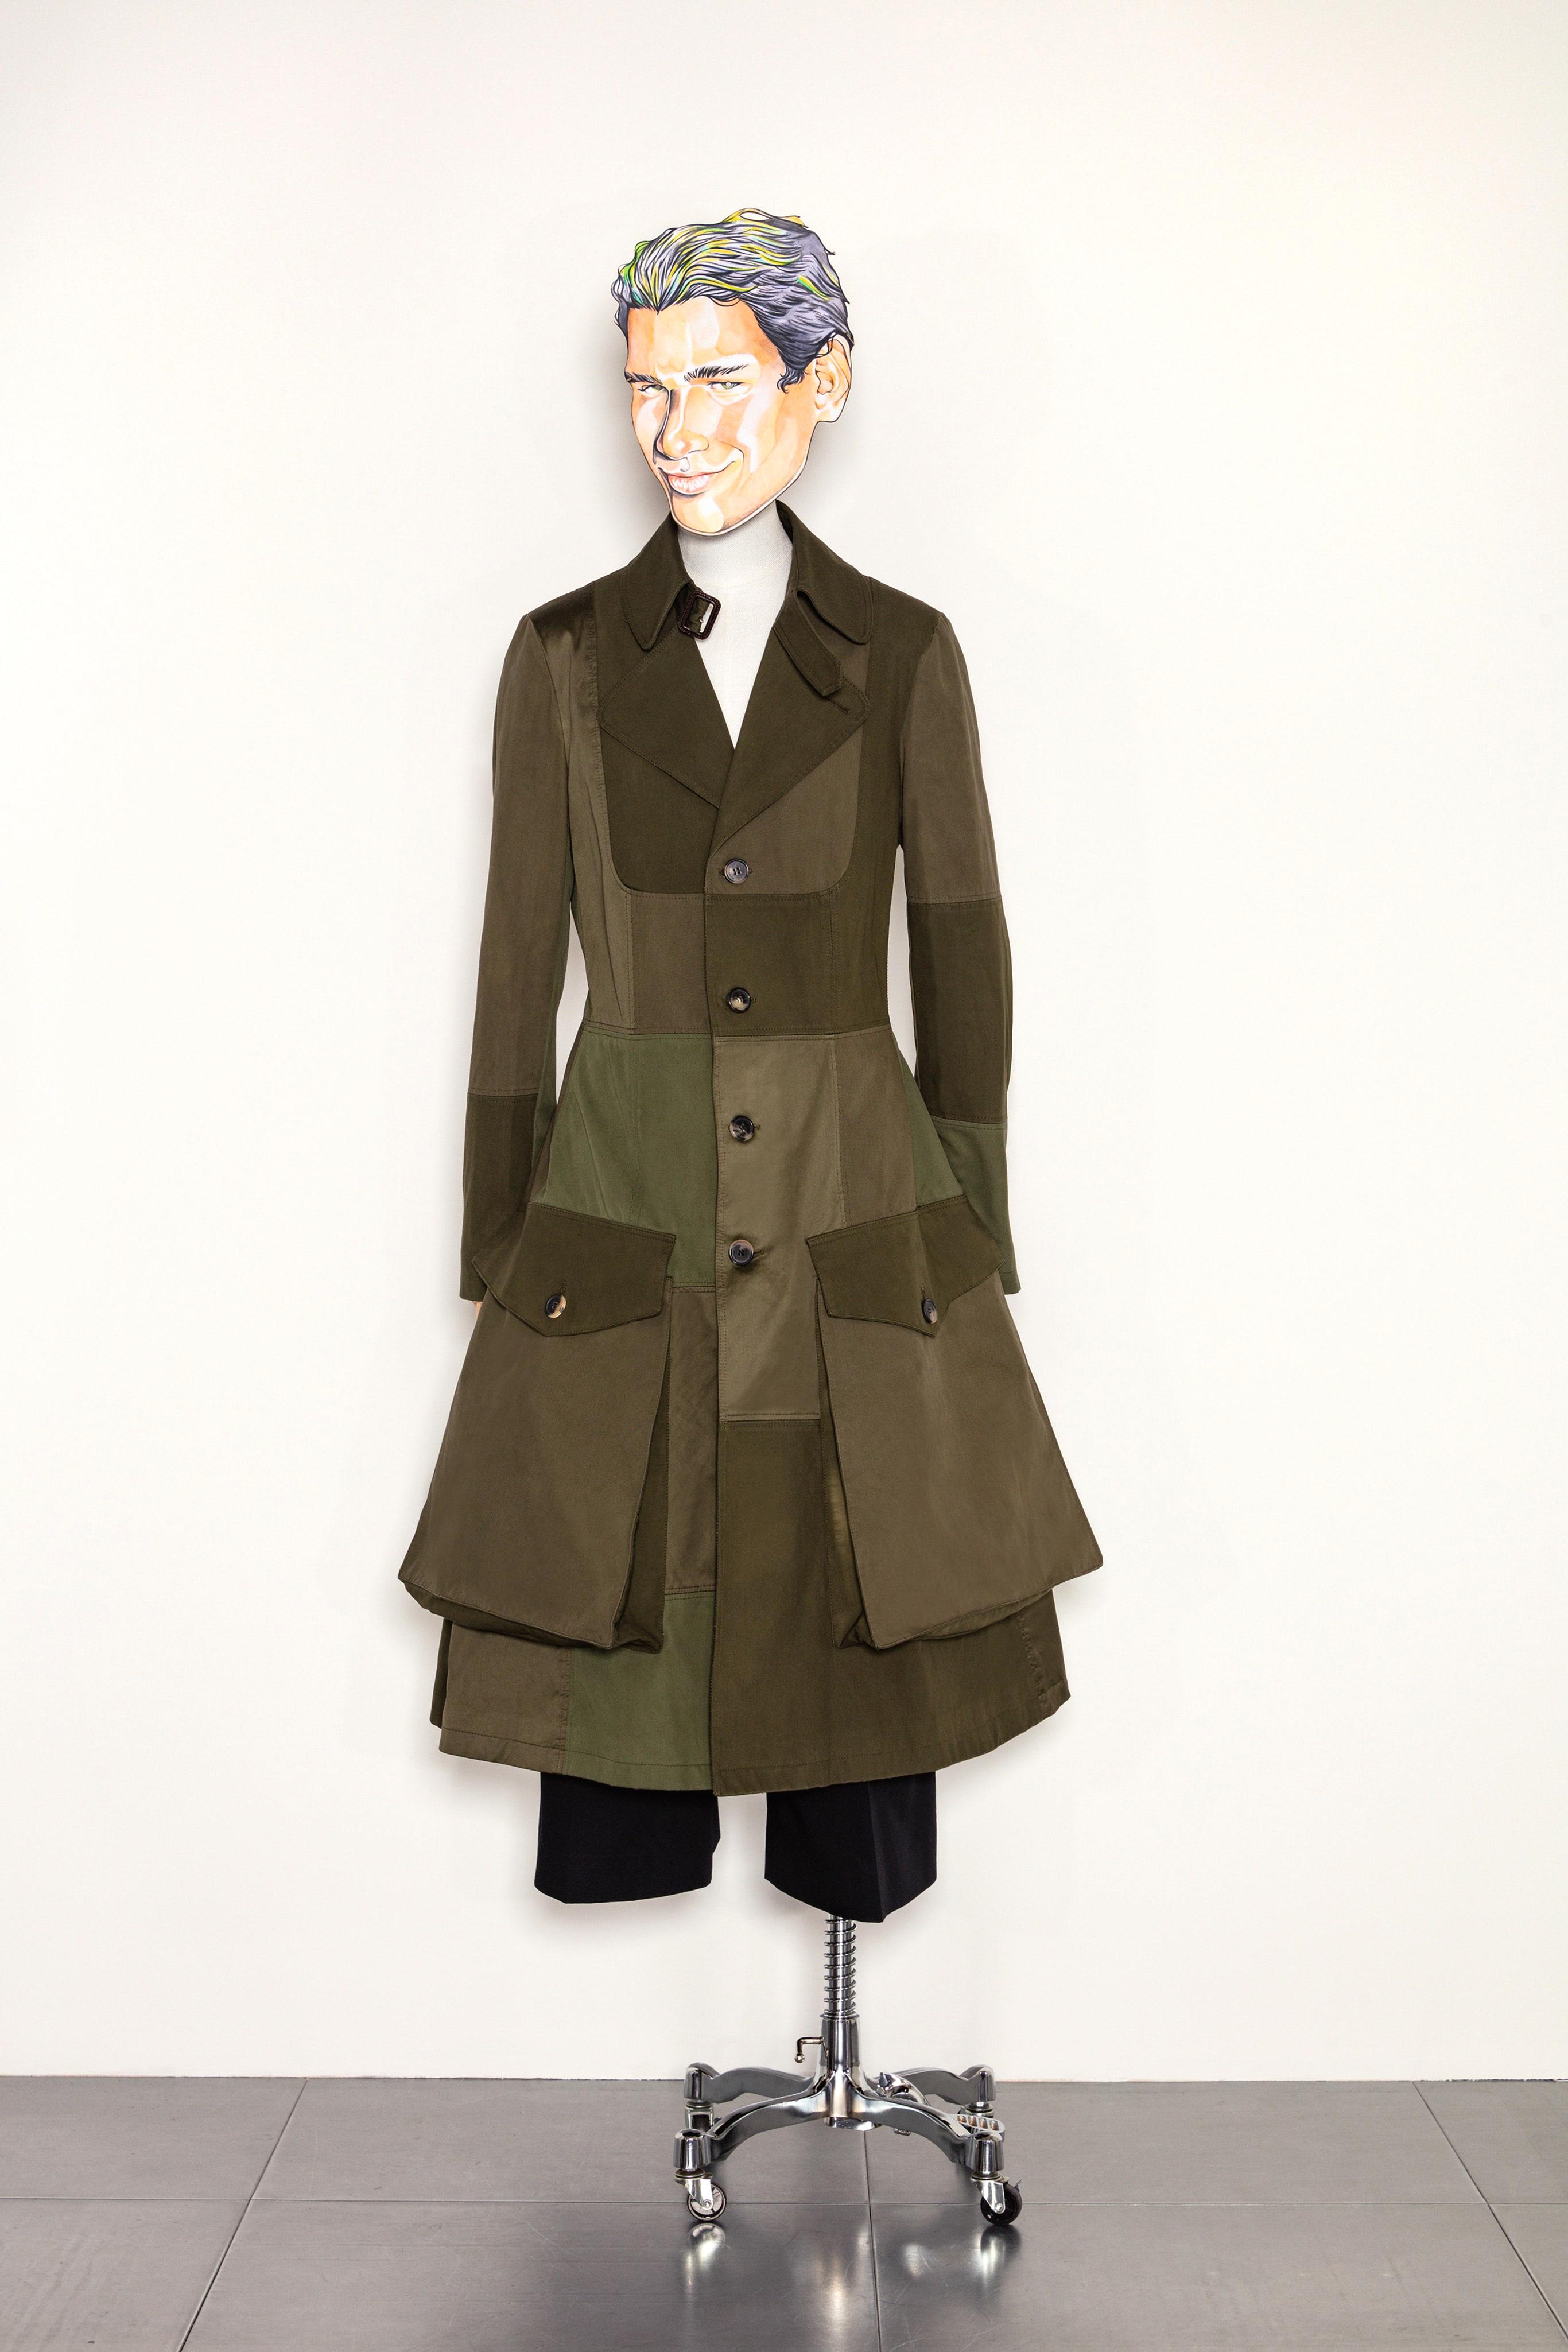 JW Anderson Spring/Summer 2021 Menswear